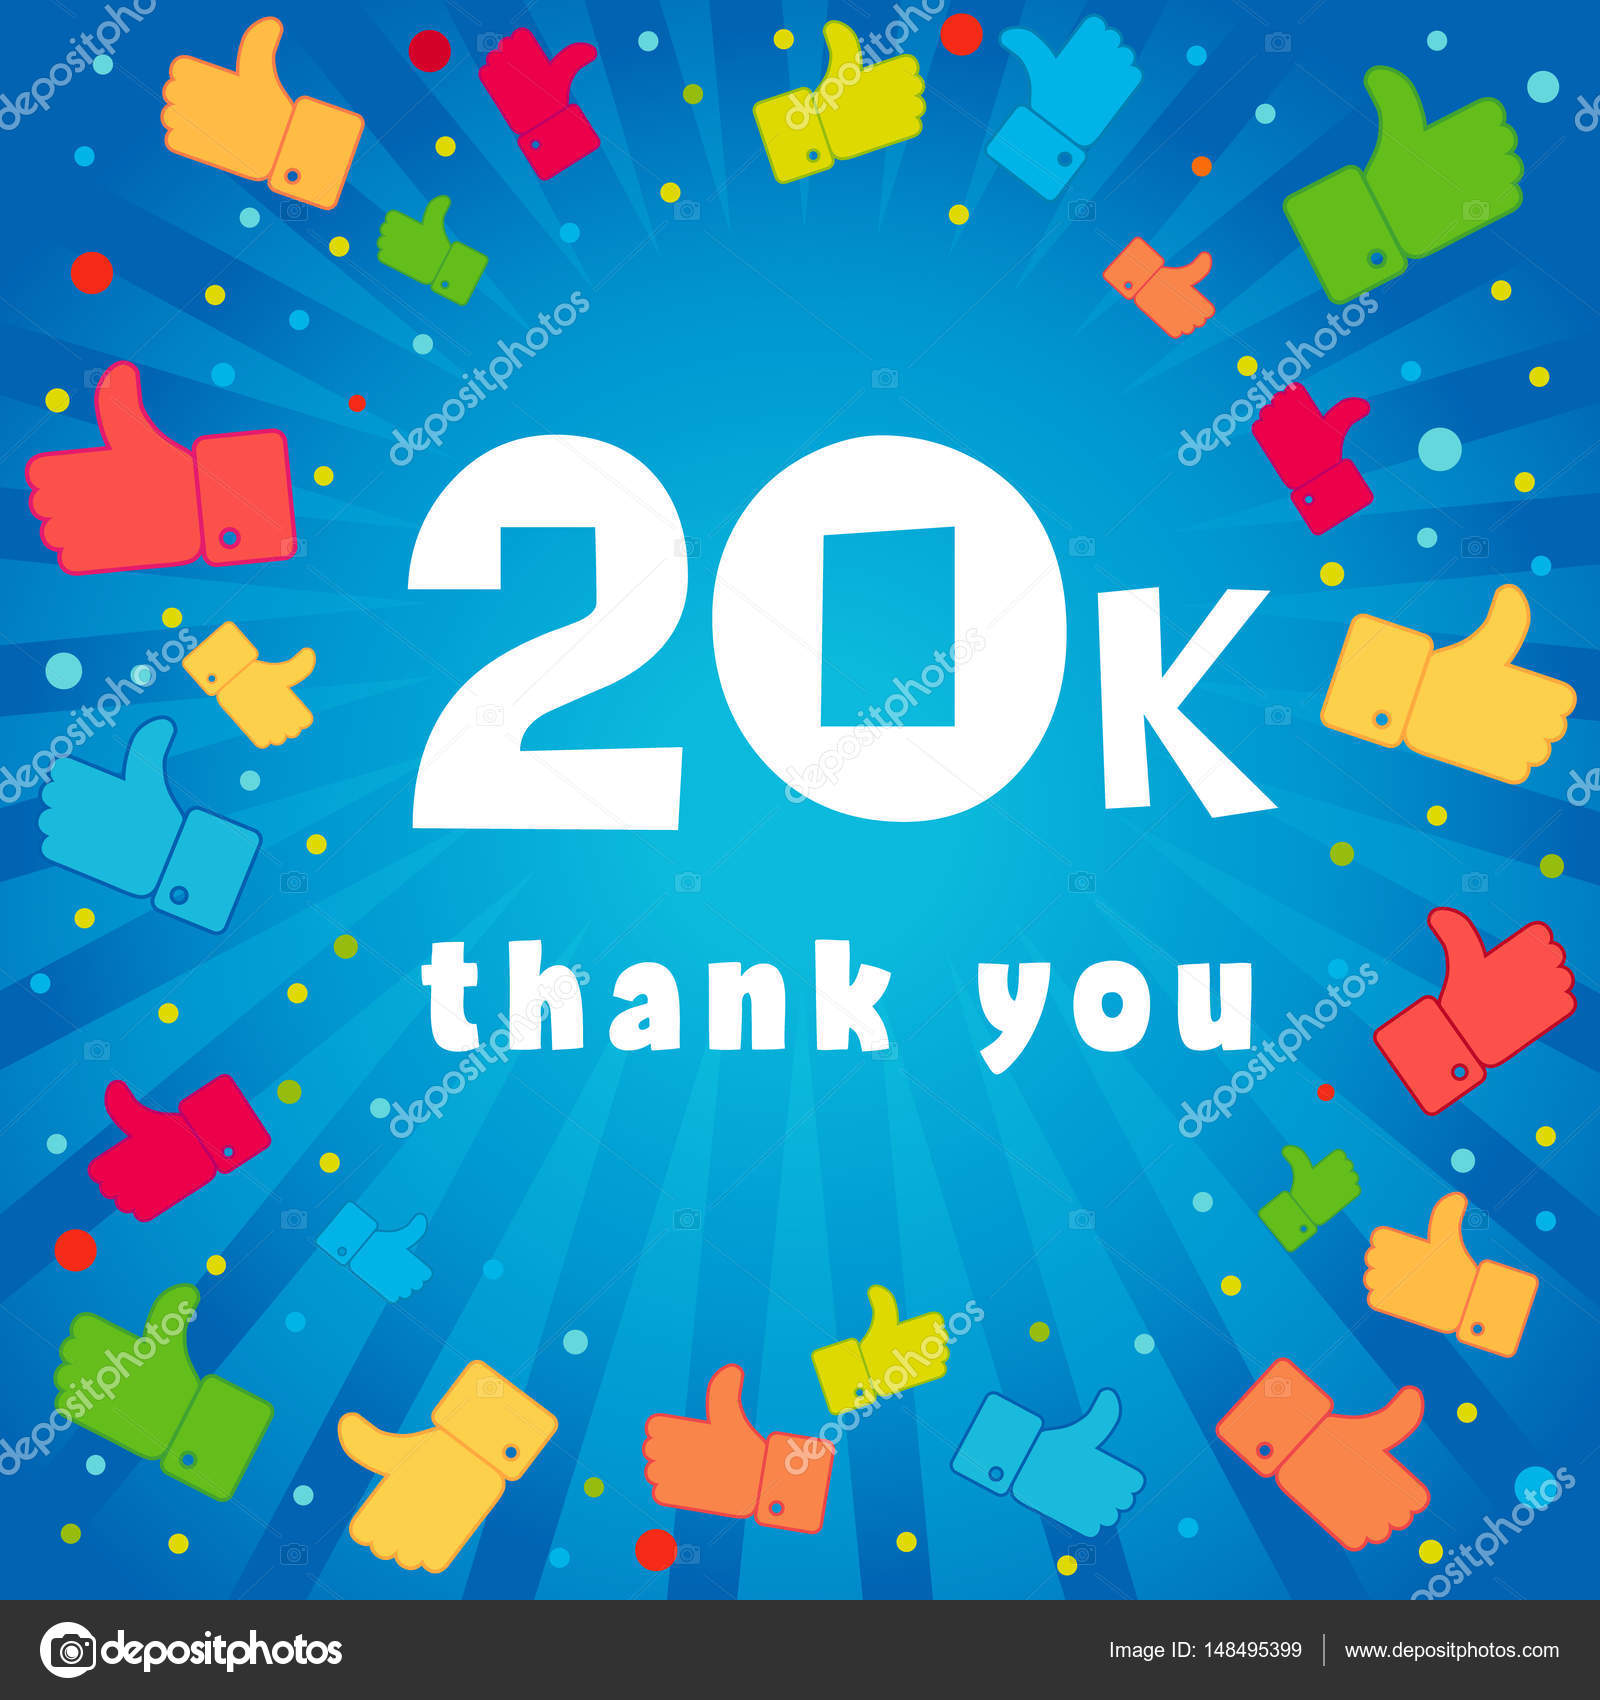 20k thank you banner stock vector koltukov alek 148495399